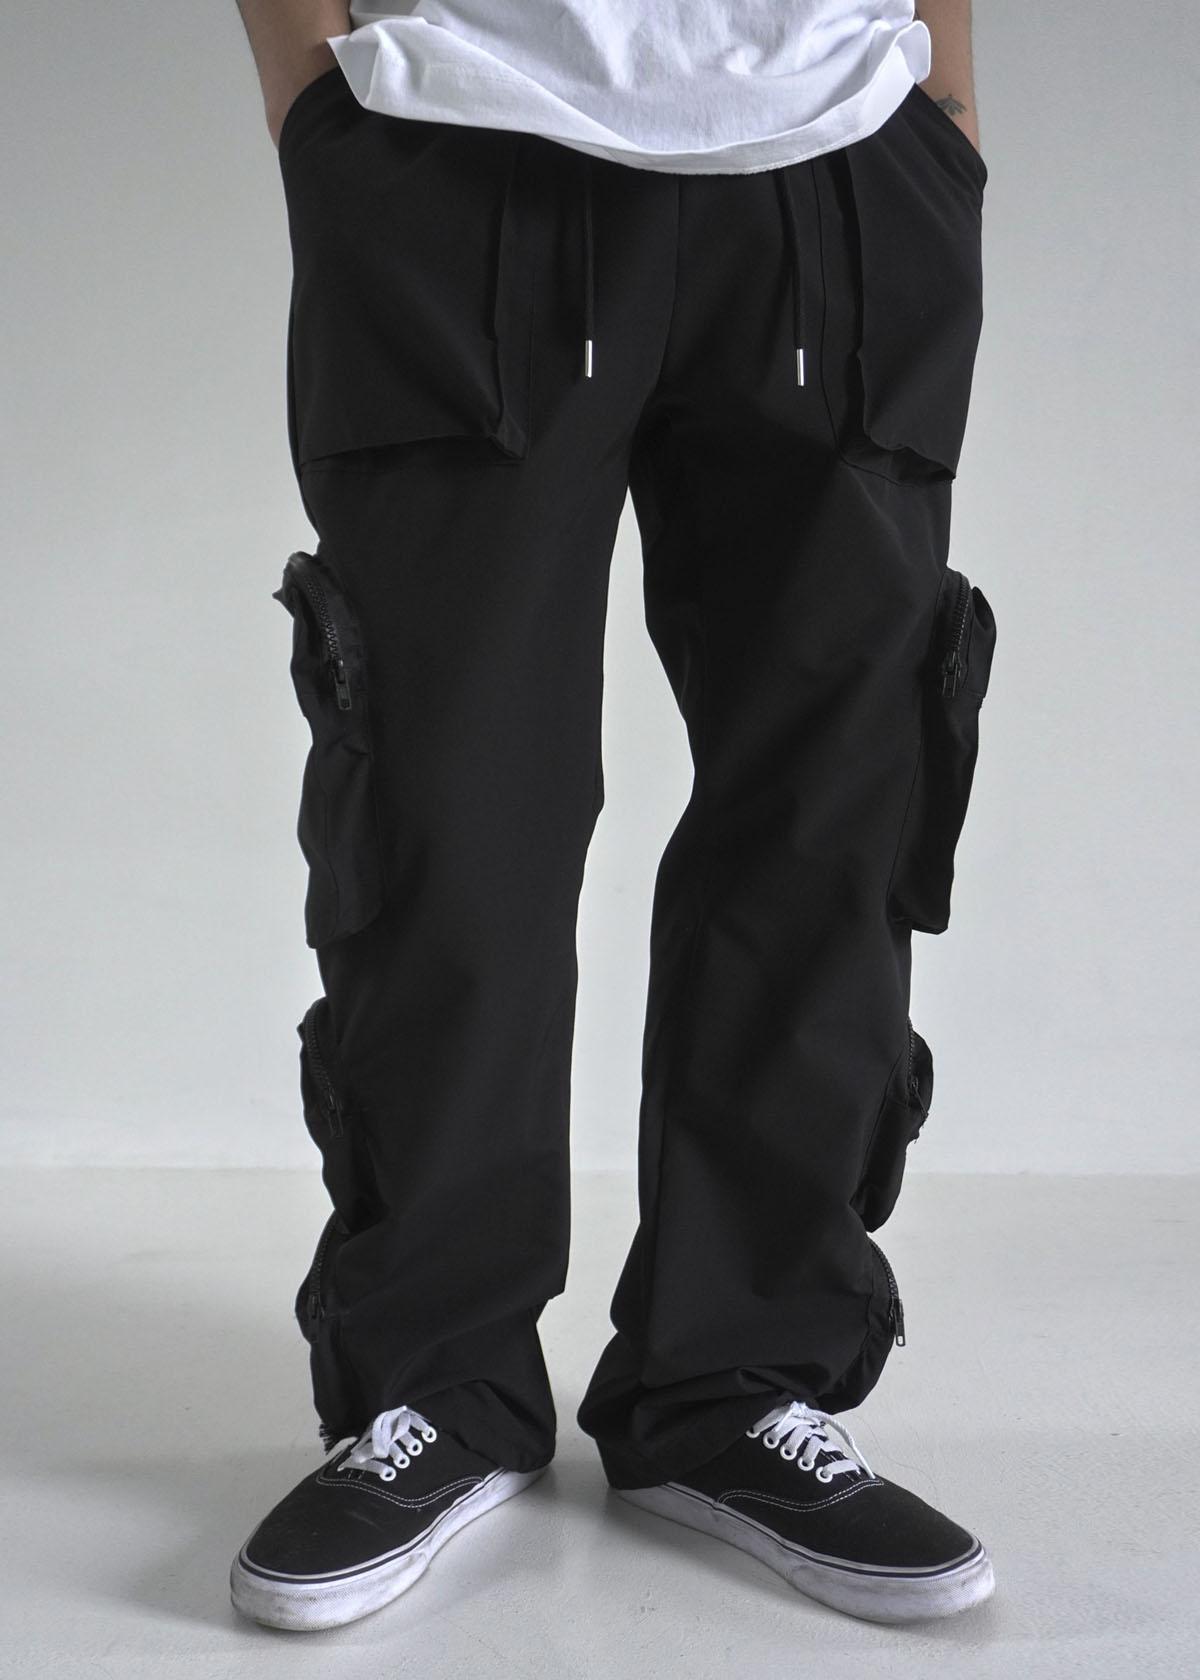 Multi Pocket Banding Pants (2Color)